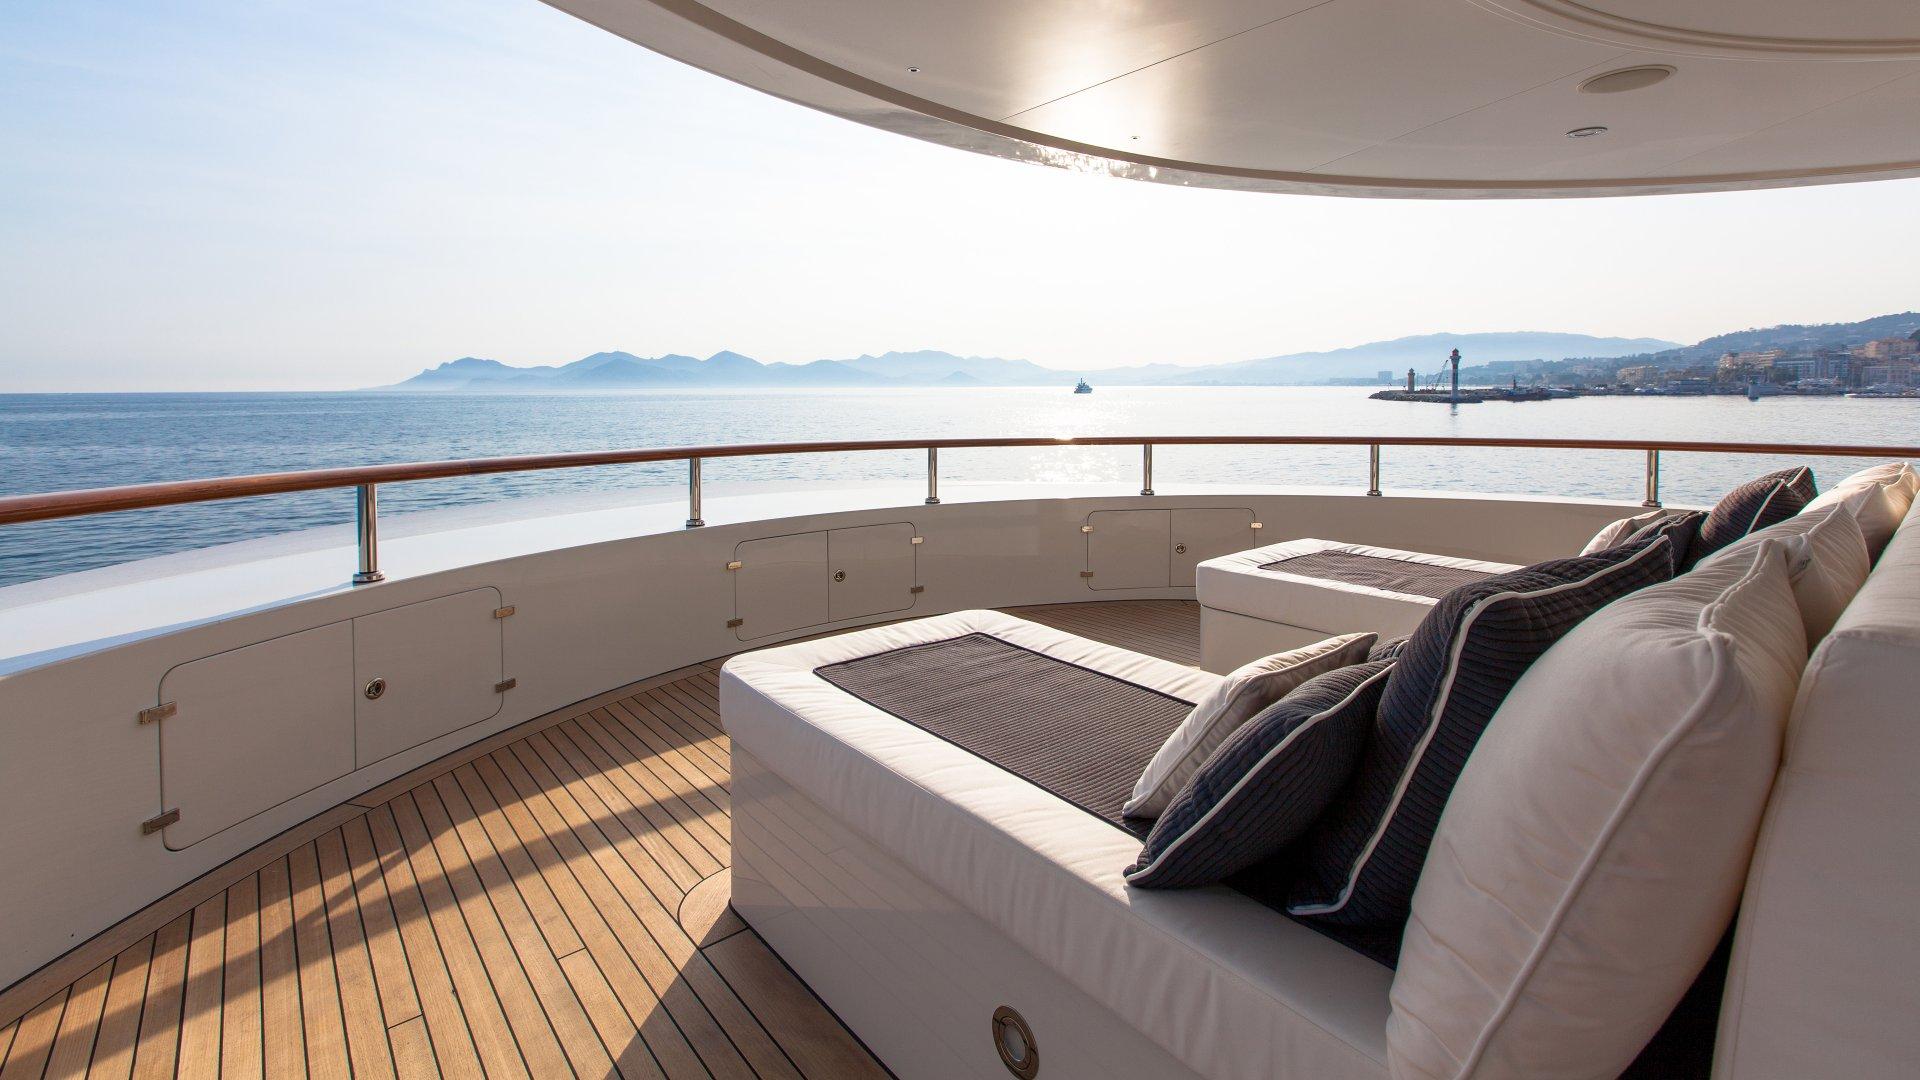 Yacht Pride Exterior under the sun